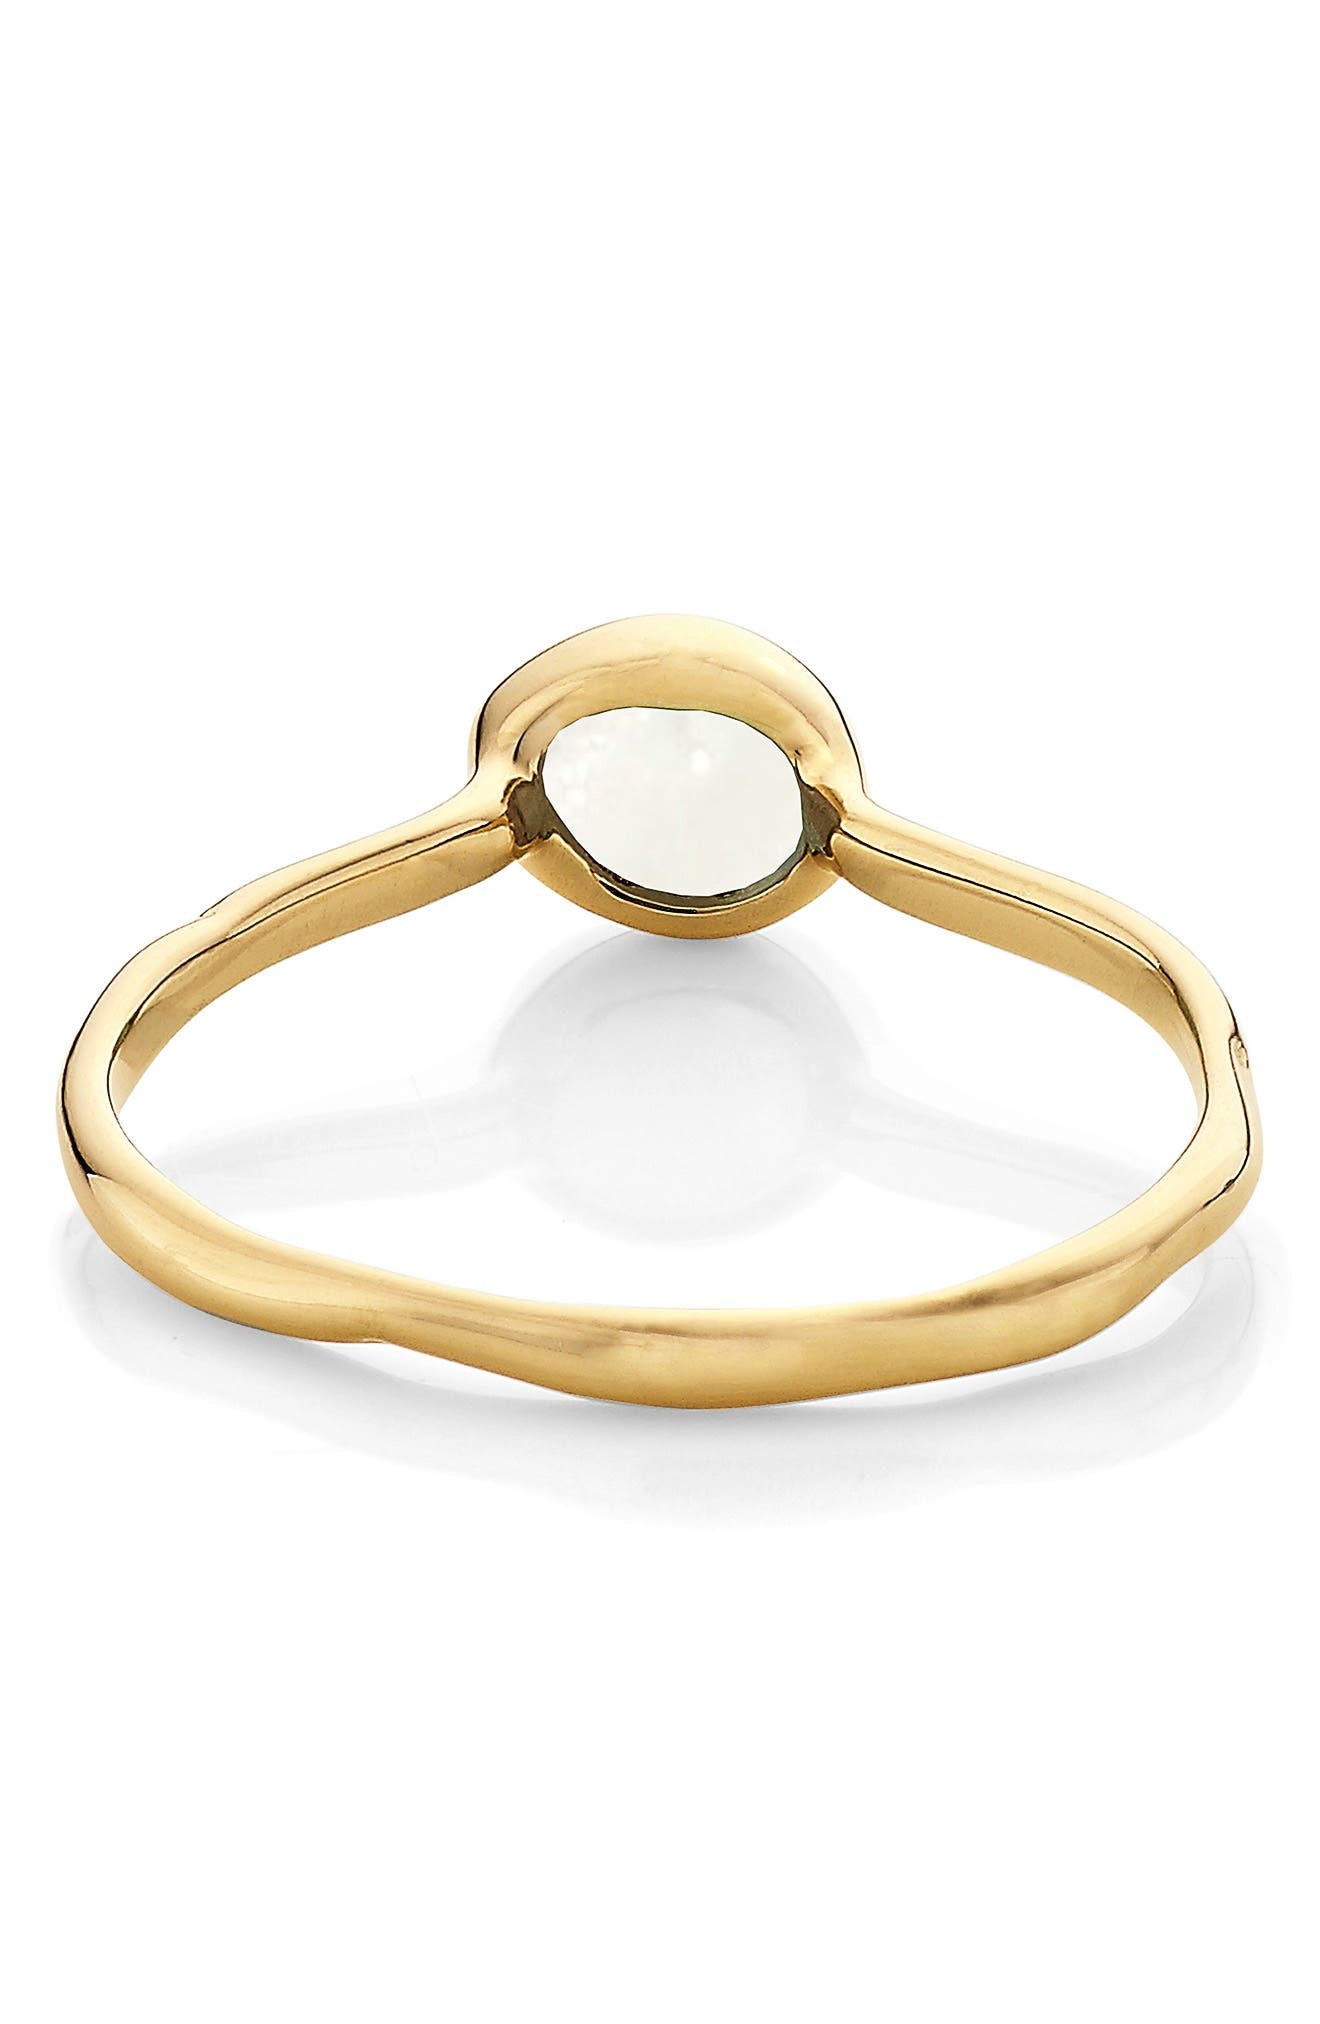 Siren Small Semiprecious Stone Stacking Ring,                             Alternate thumbnail 3, color,                             GOLD/ MOONSTONE